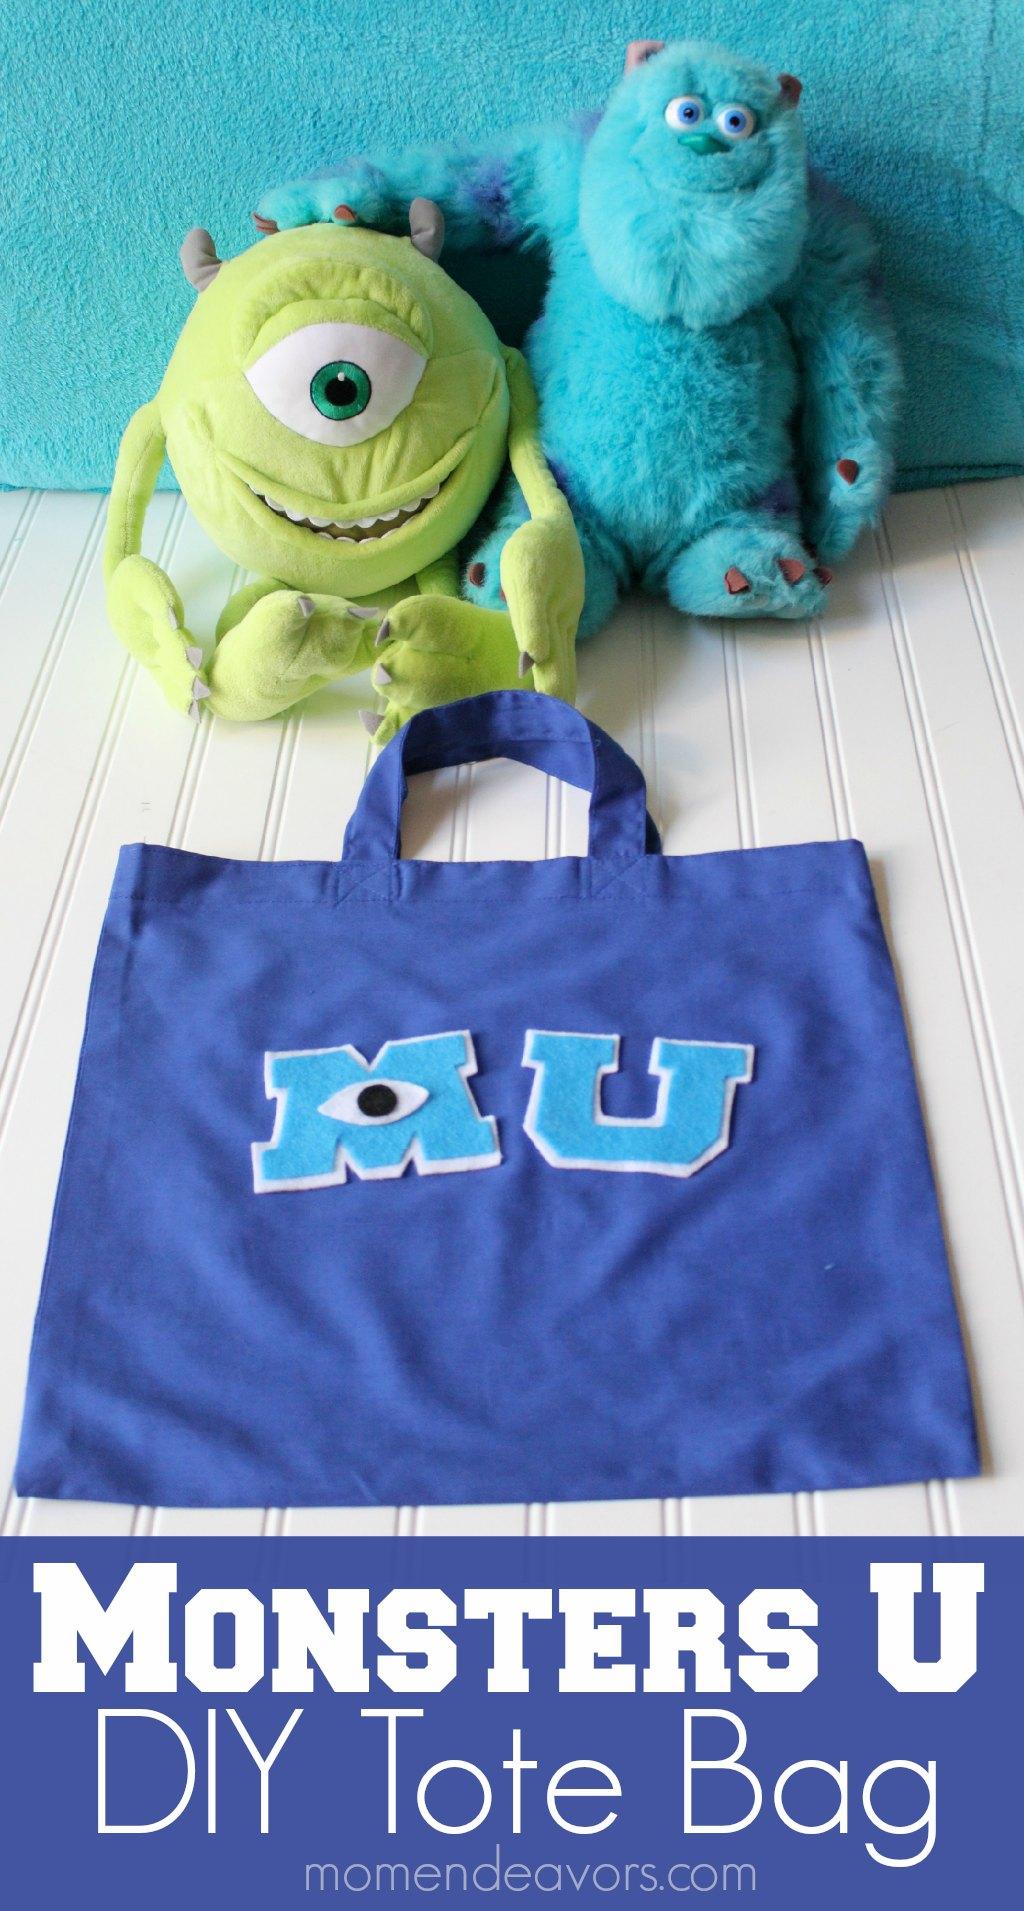 Monsters University DIY Tote Bag #MonstersU